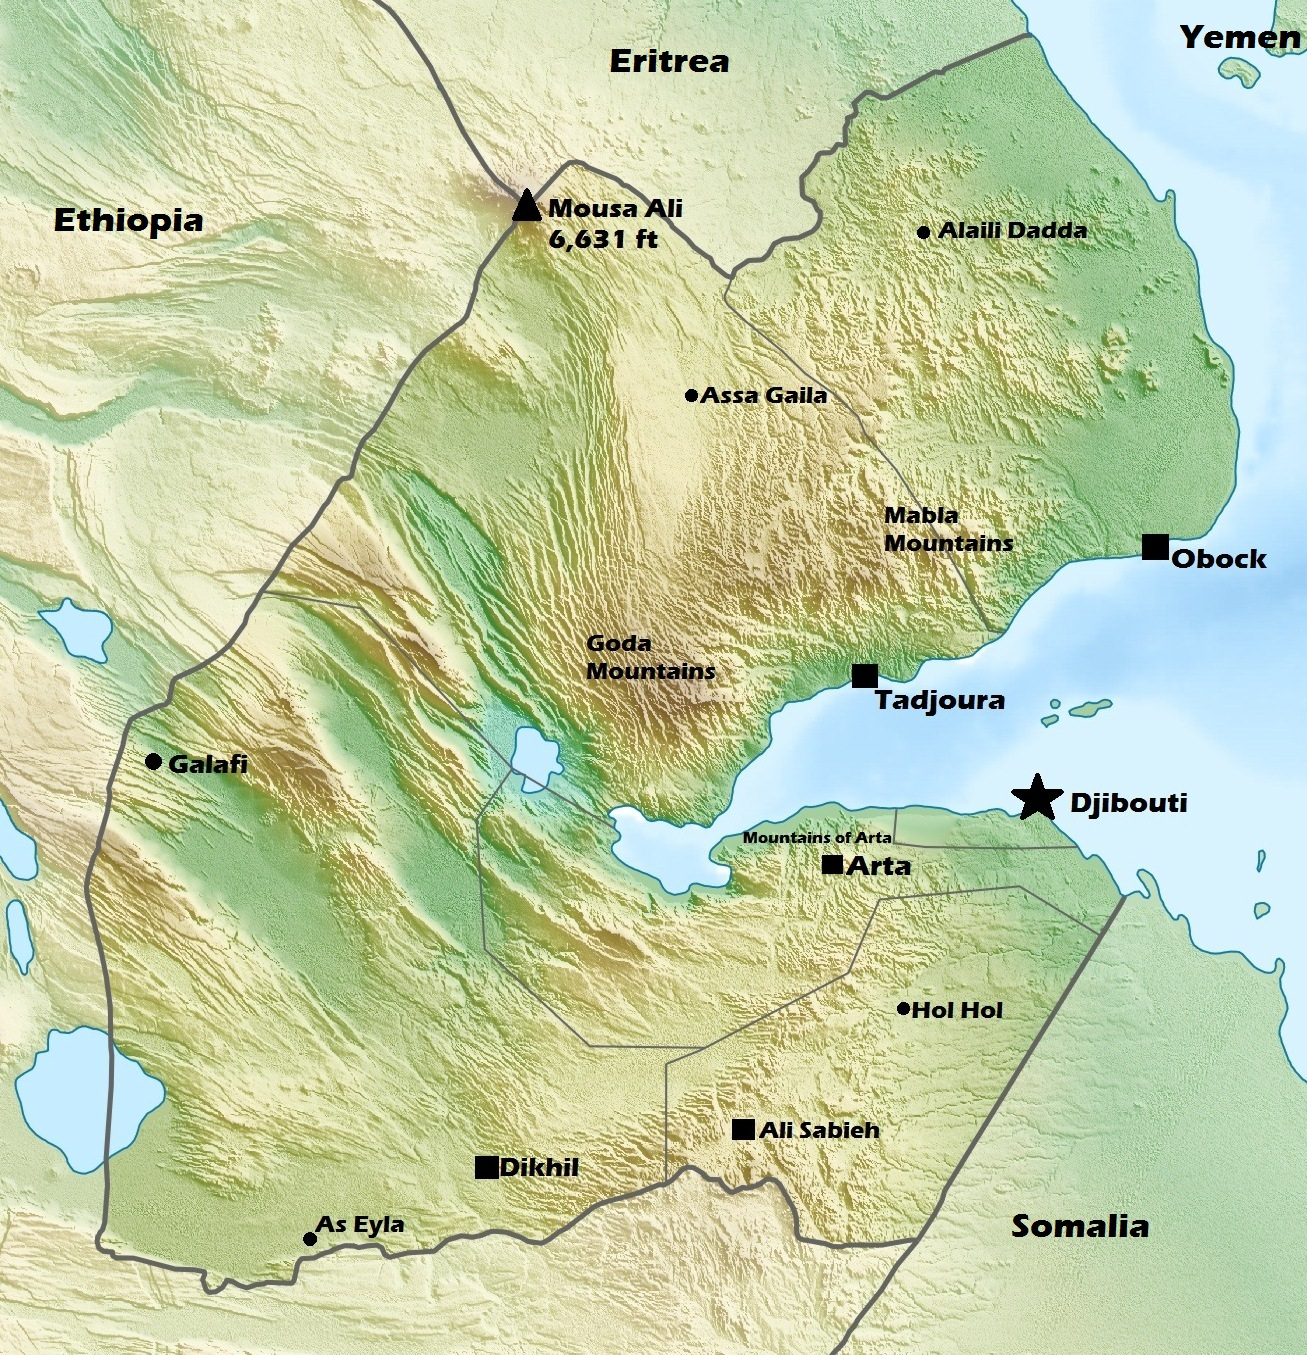 DjiboutiGeographymap Dead Sea On The World Map on the sea of azov on world map, the sea of japan on world map, negev desert on world map, great rift valley on world map, sea of galilee on world map,